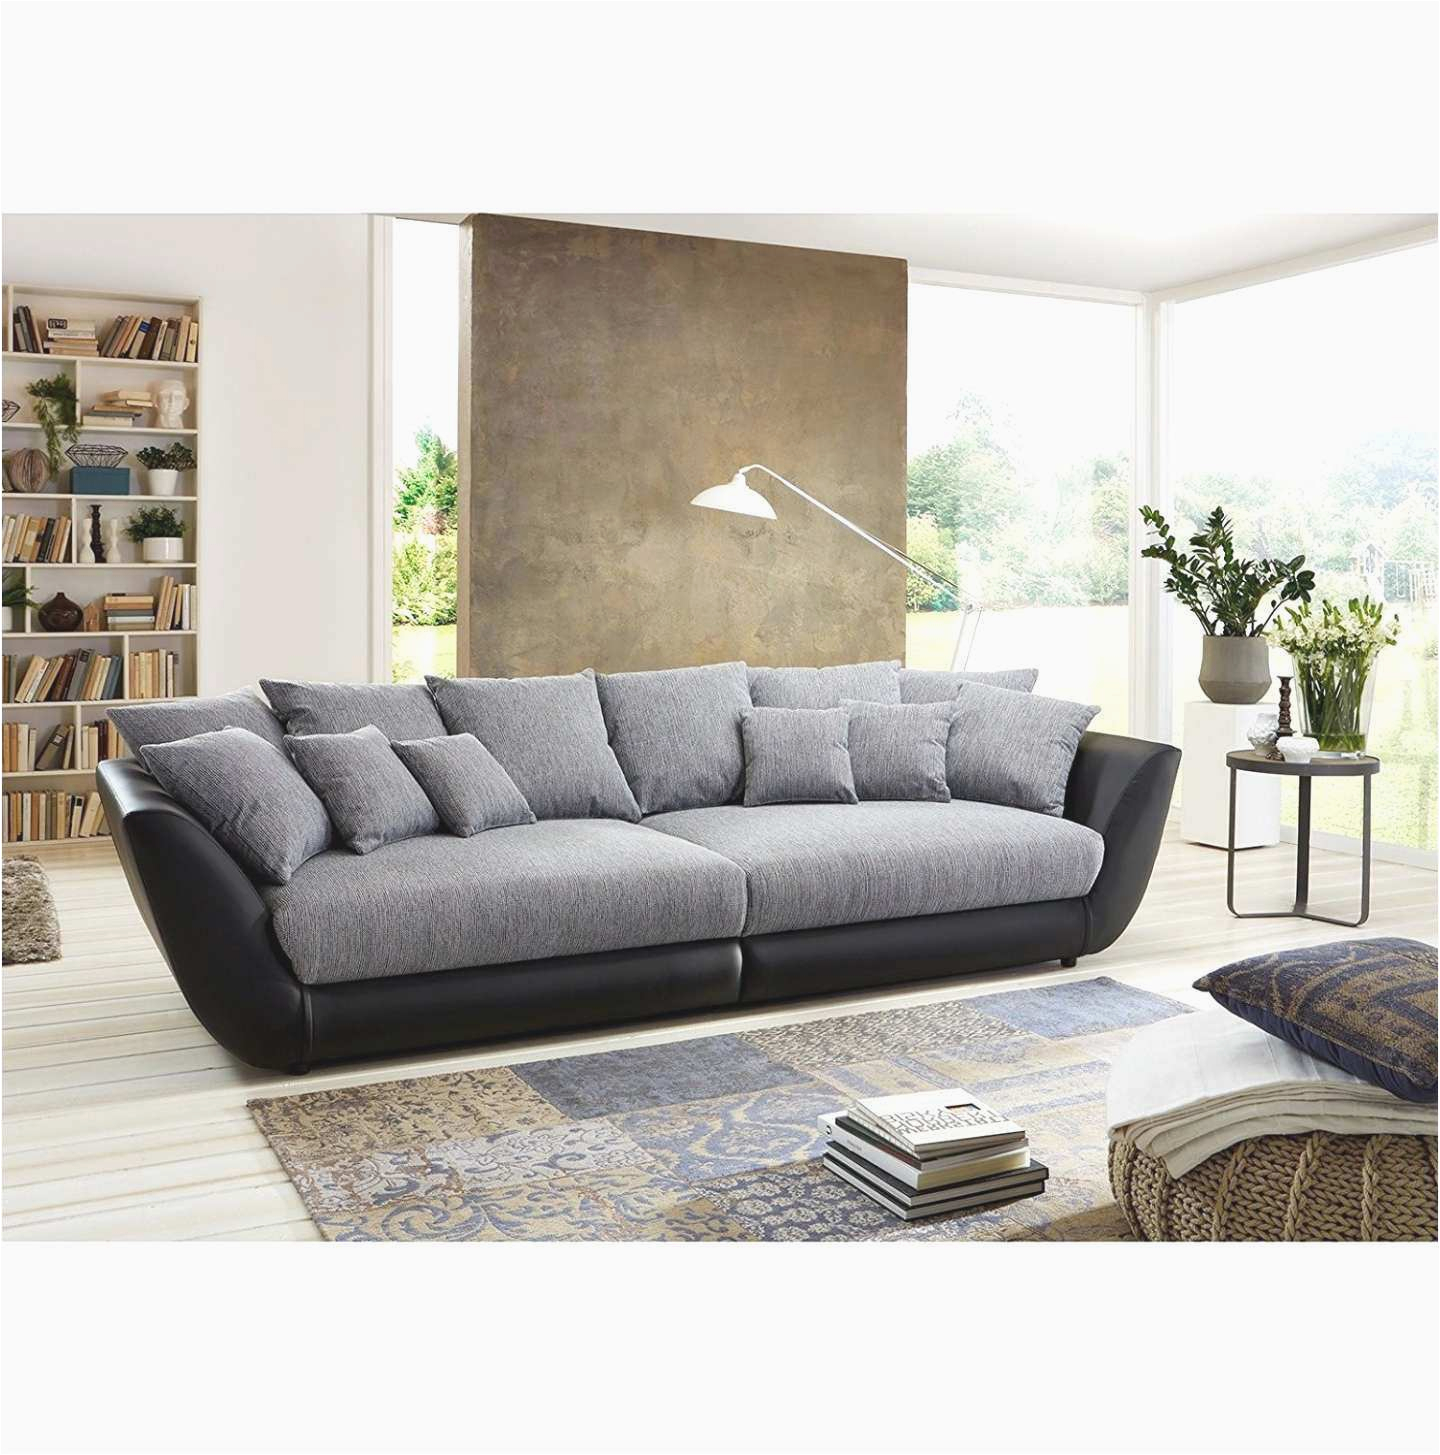 Sofa L form Grau sofa L form Frisch U sofa Xxl Schön Big sofa L form Luxus U